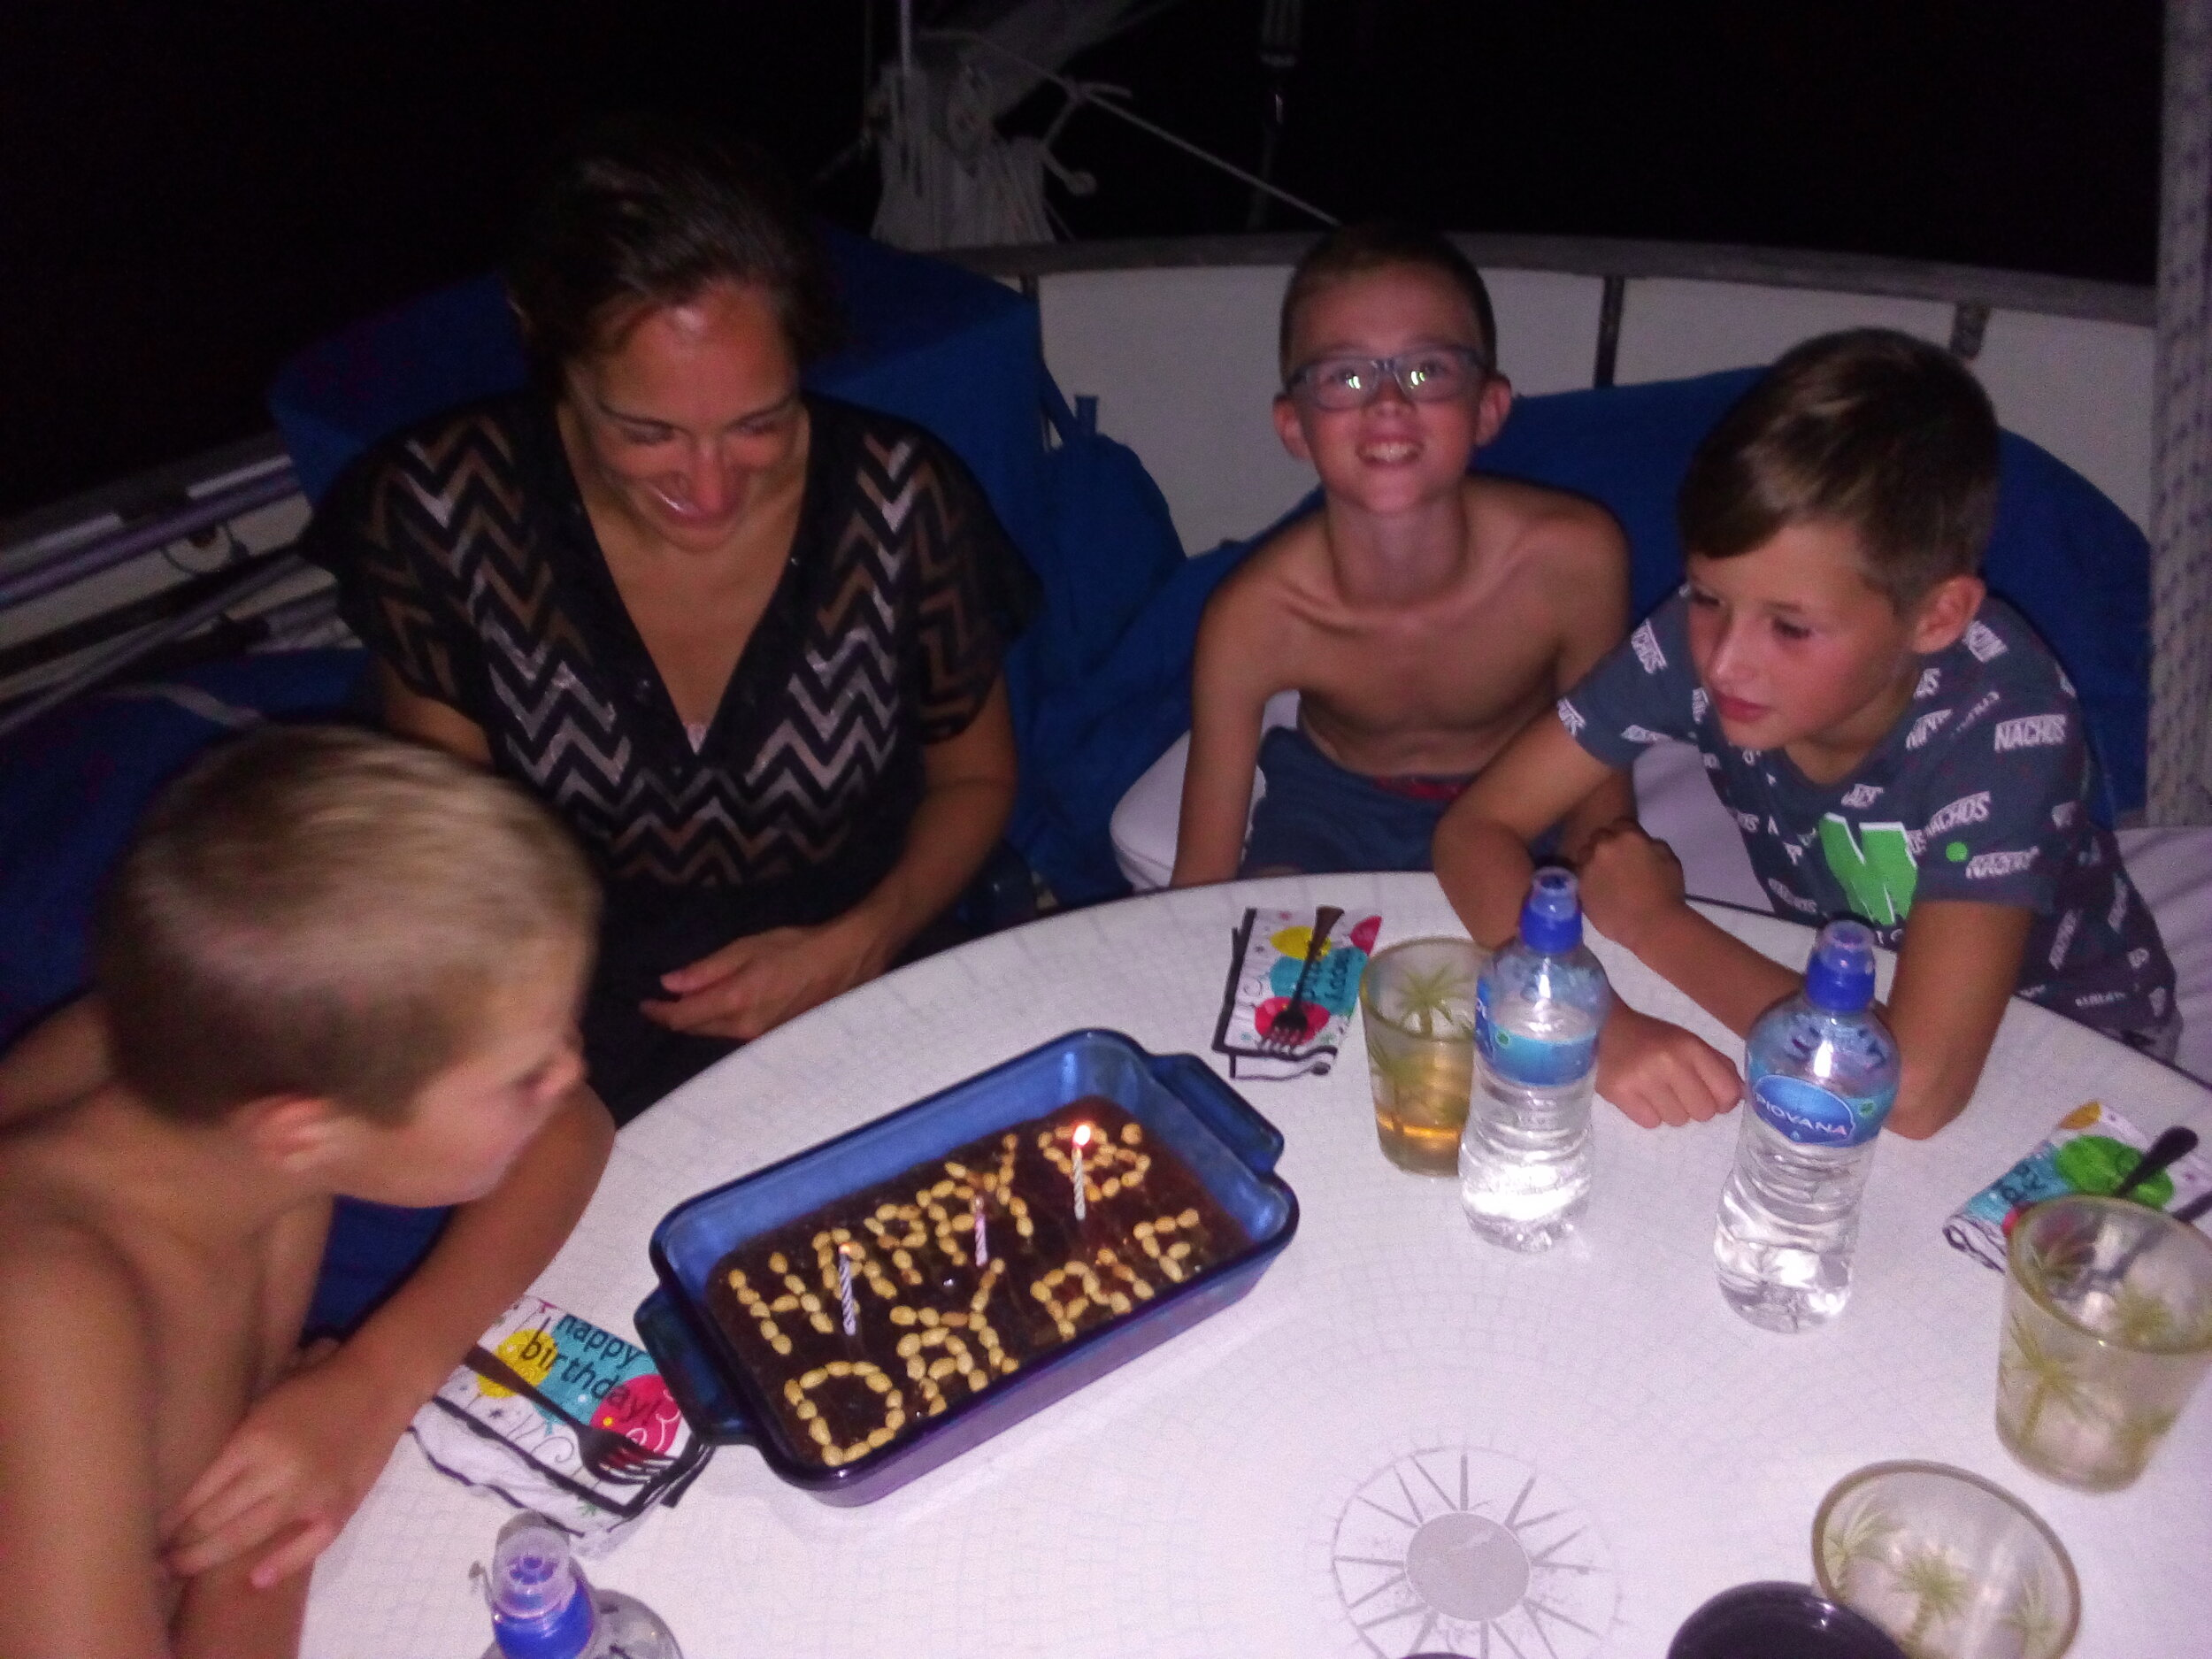 Mom & Kids B-day with cake.jpg